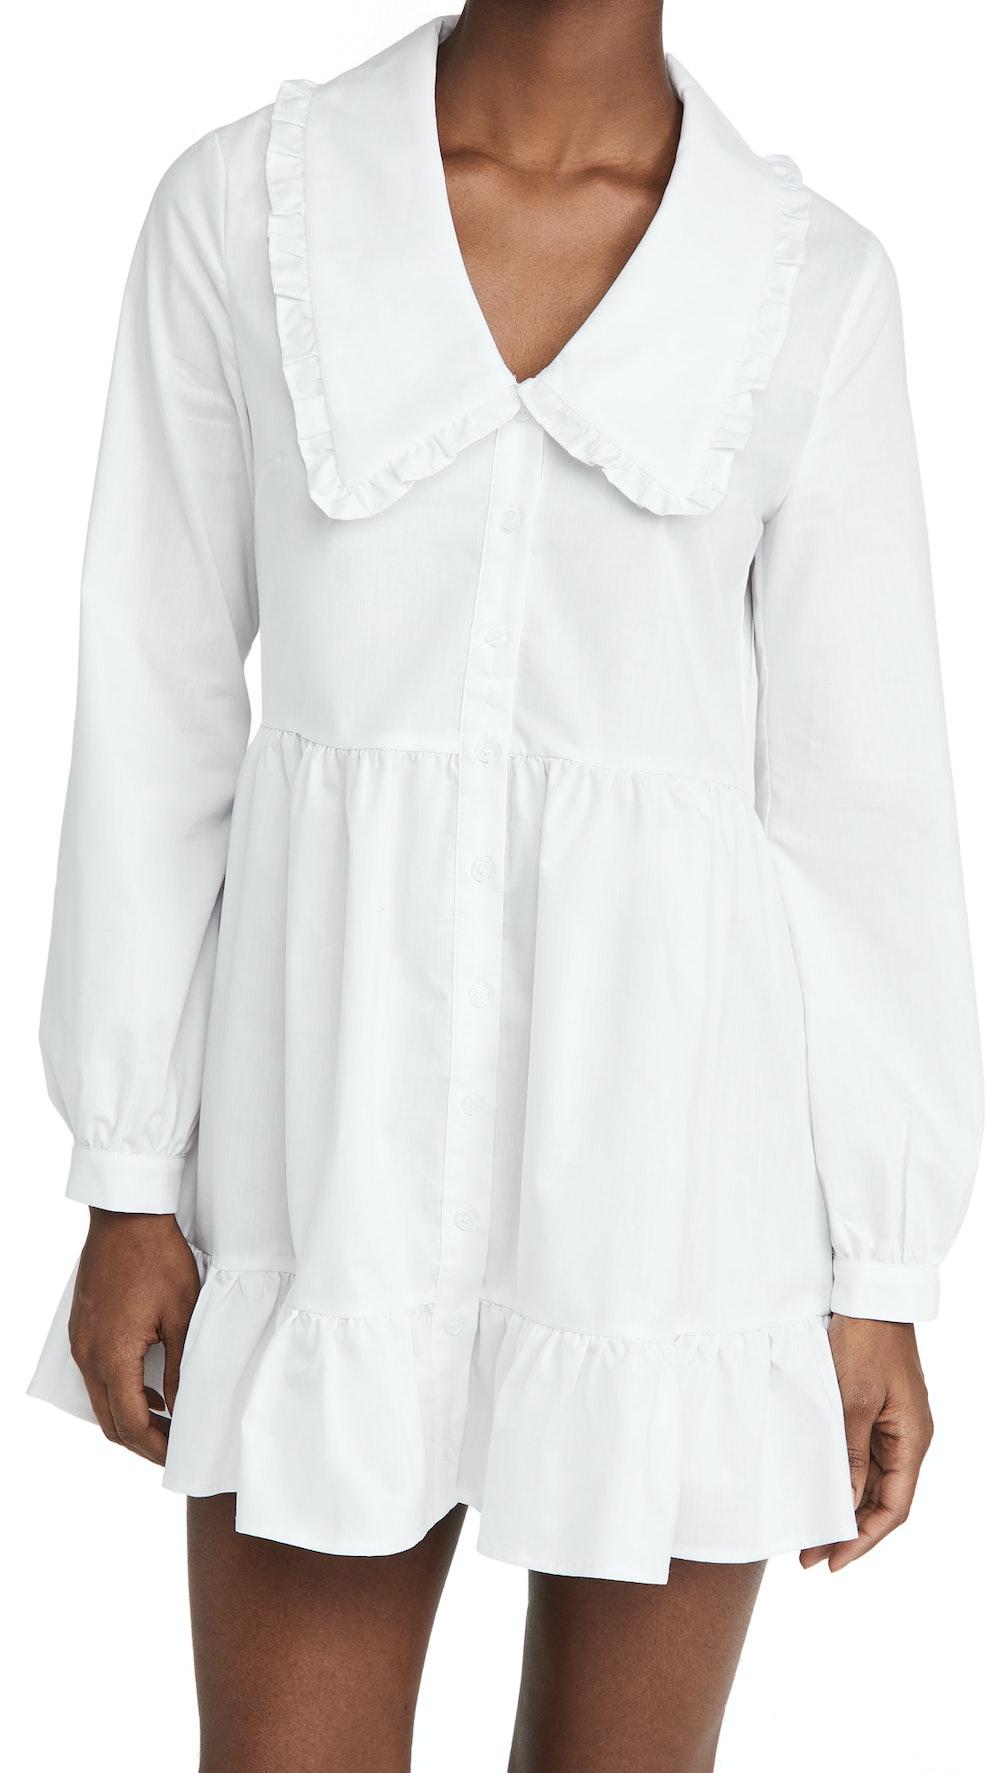 Eli Large Collared Dress